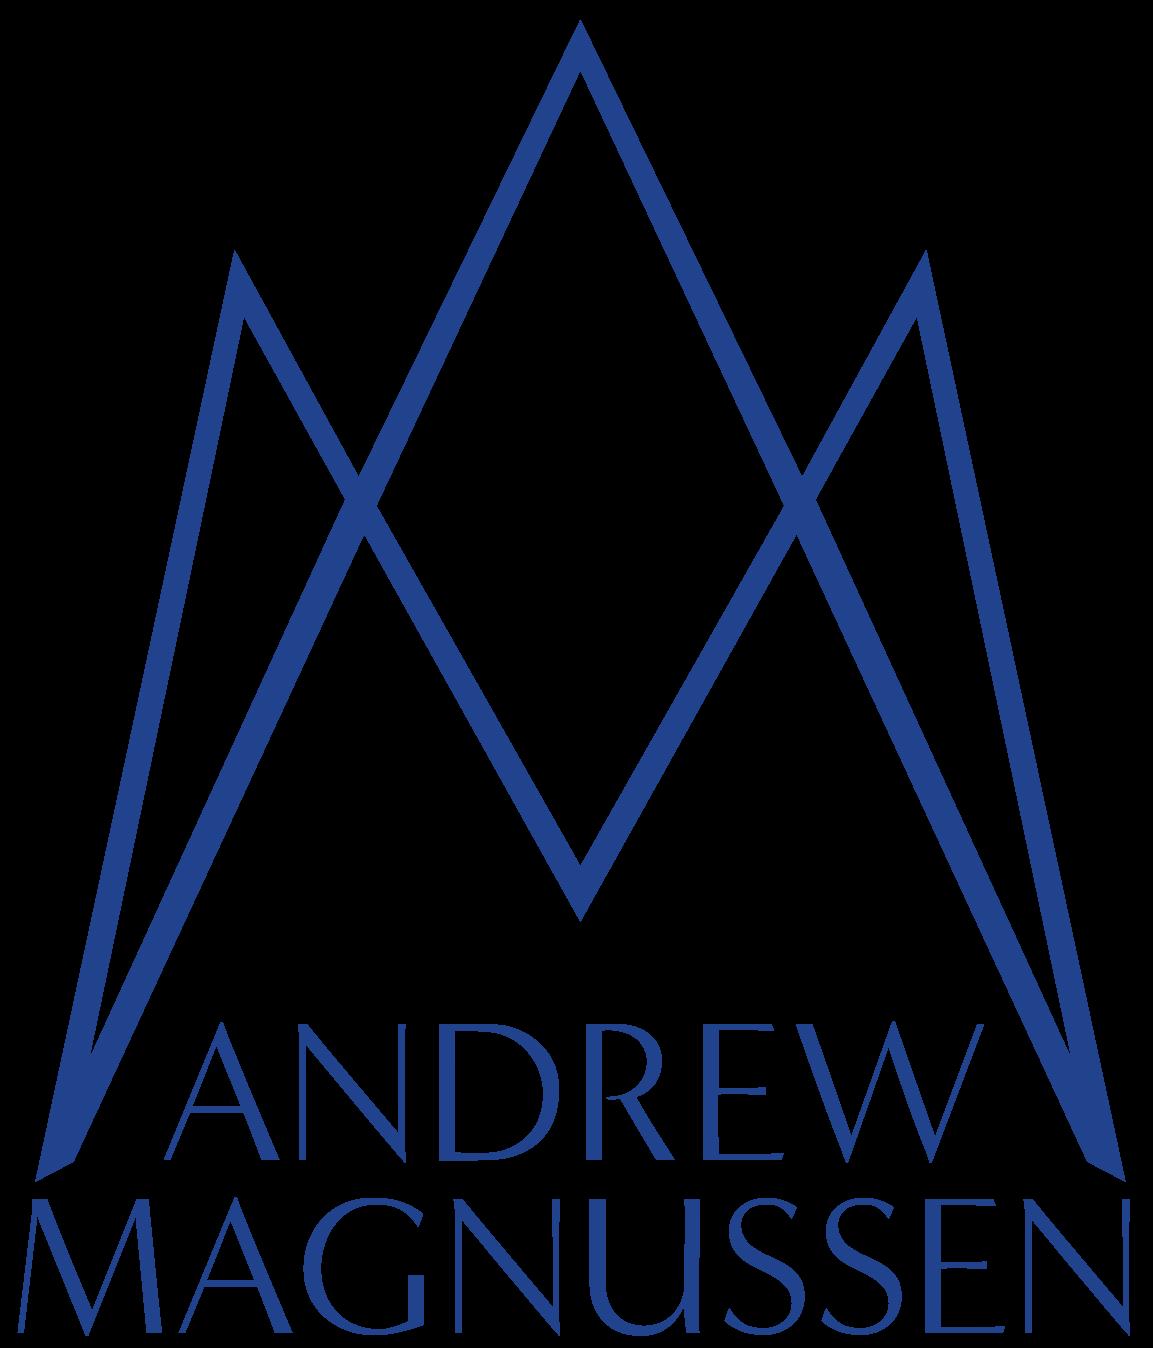 Andrew Magnussen